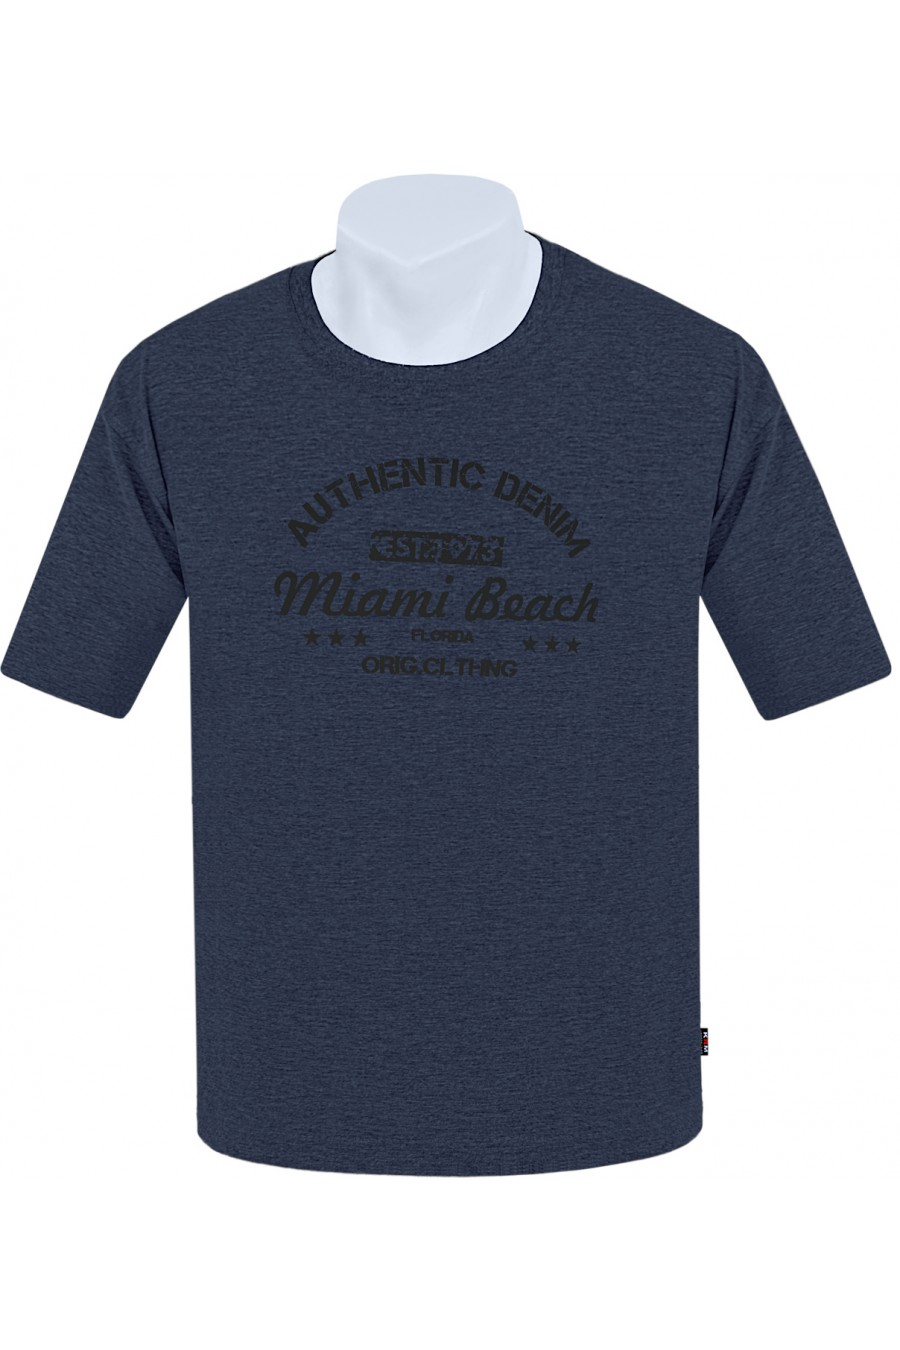 Koszulka AUTHENTIC M-8XL bawełna jeans